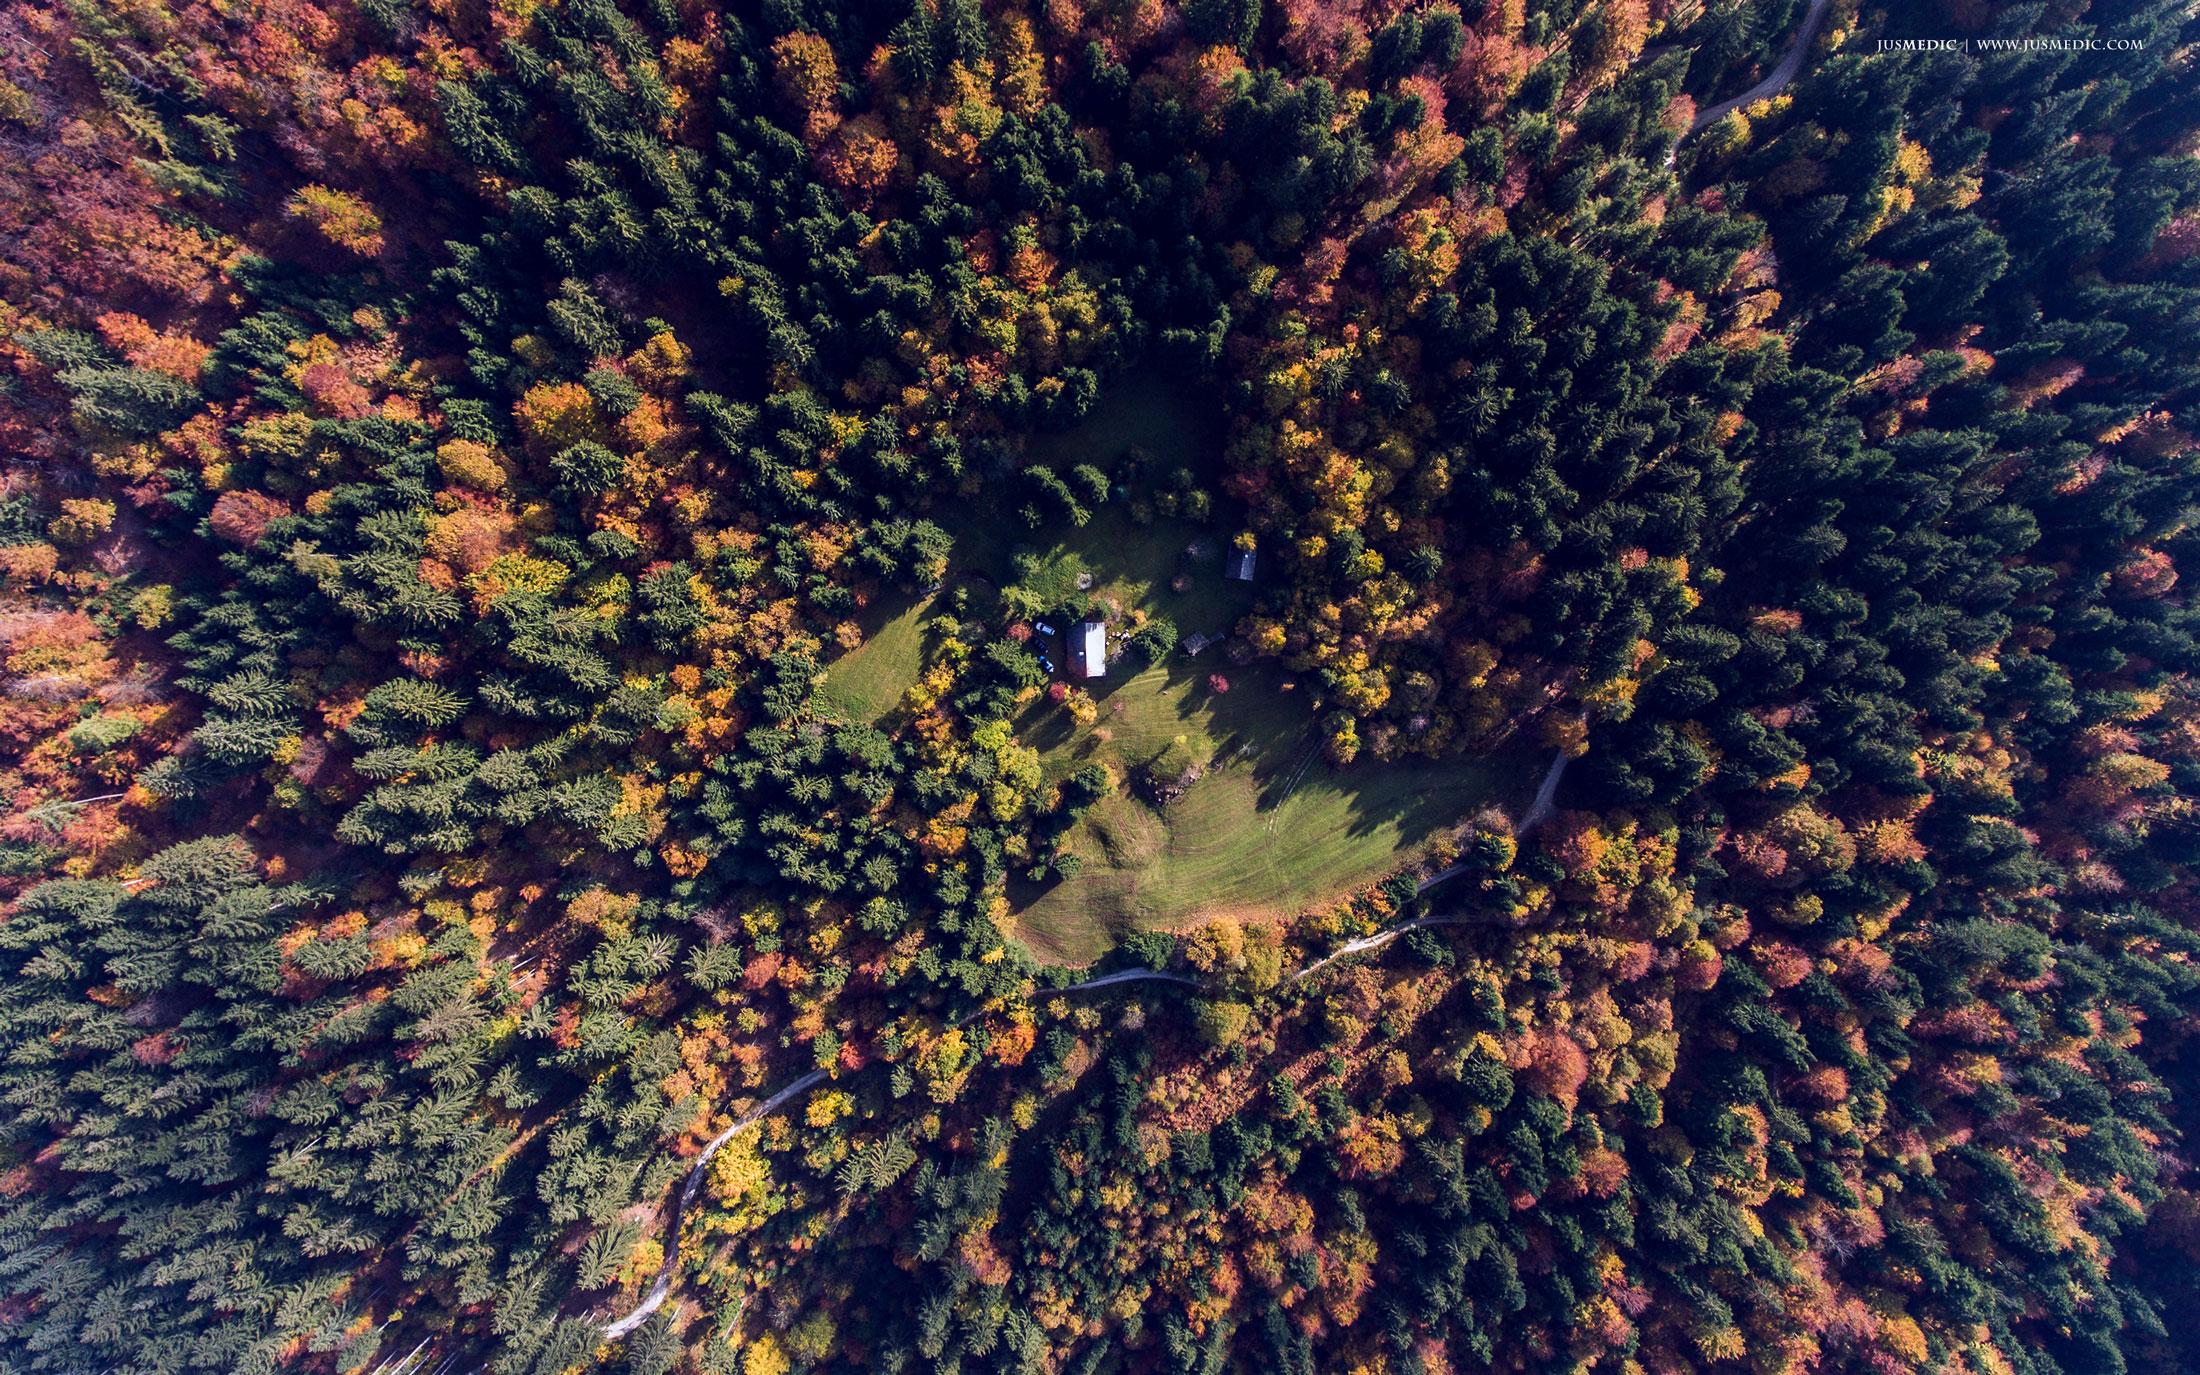 Autumn in Slovenia - www.jusmedic.com